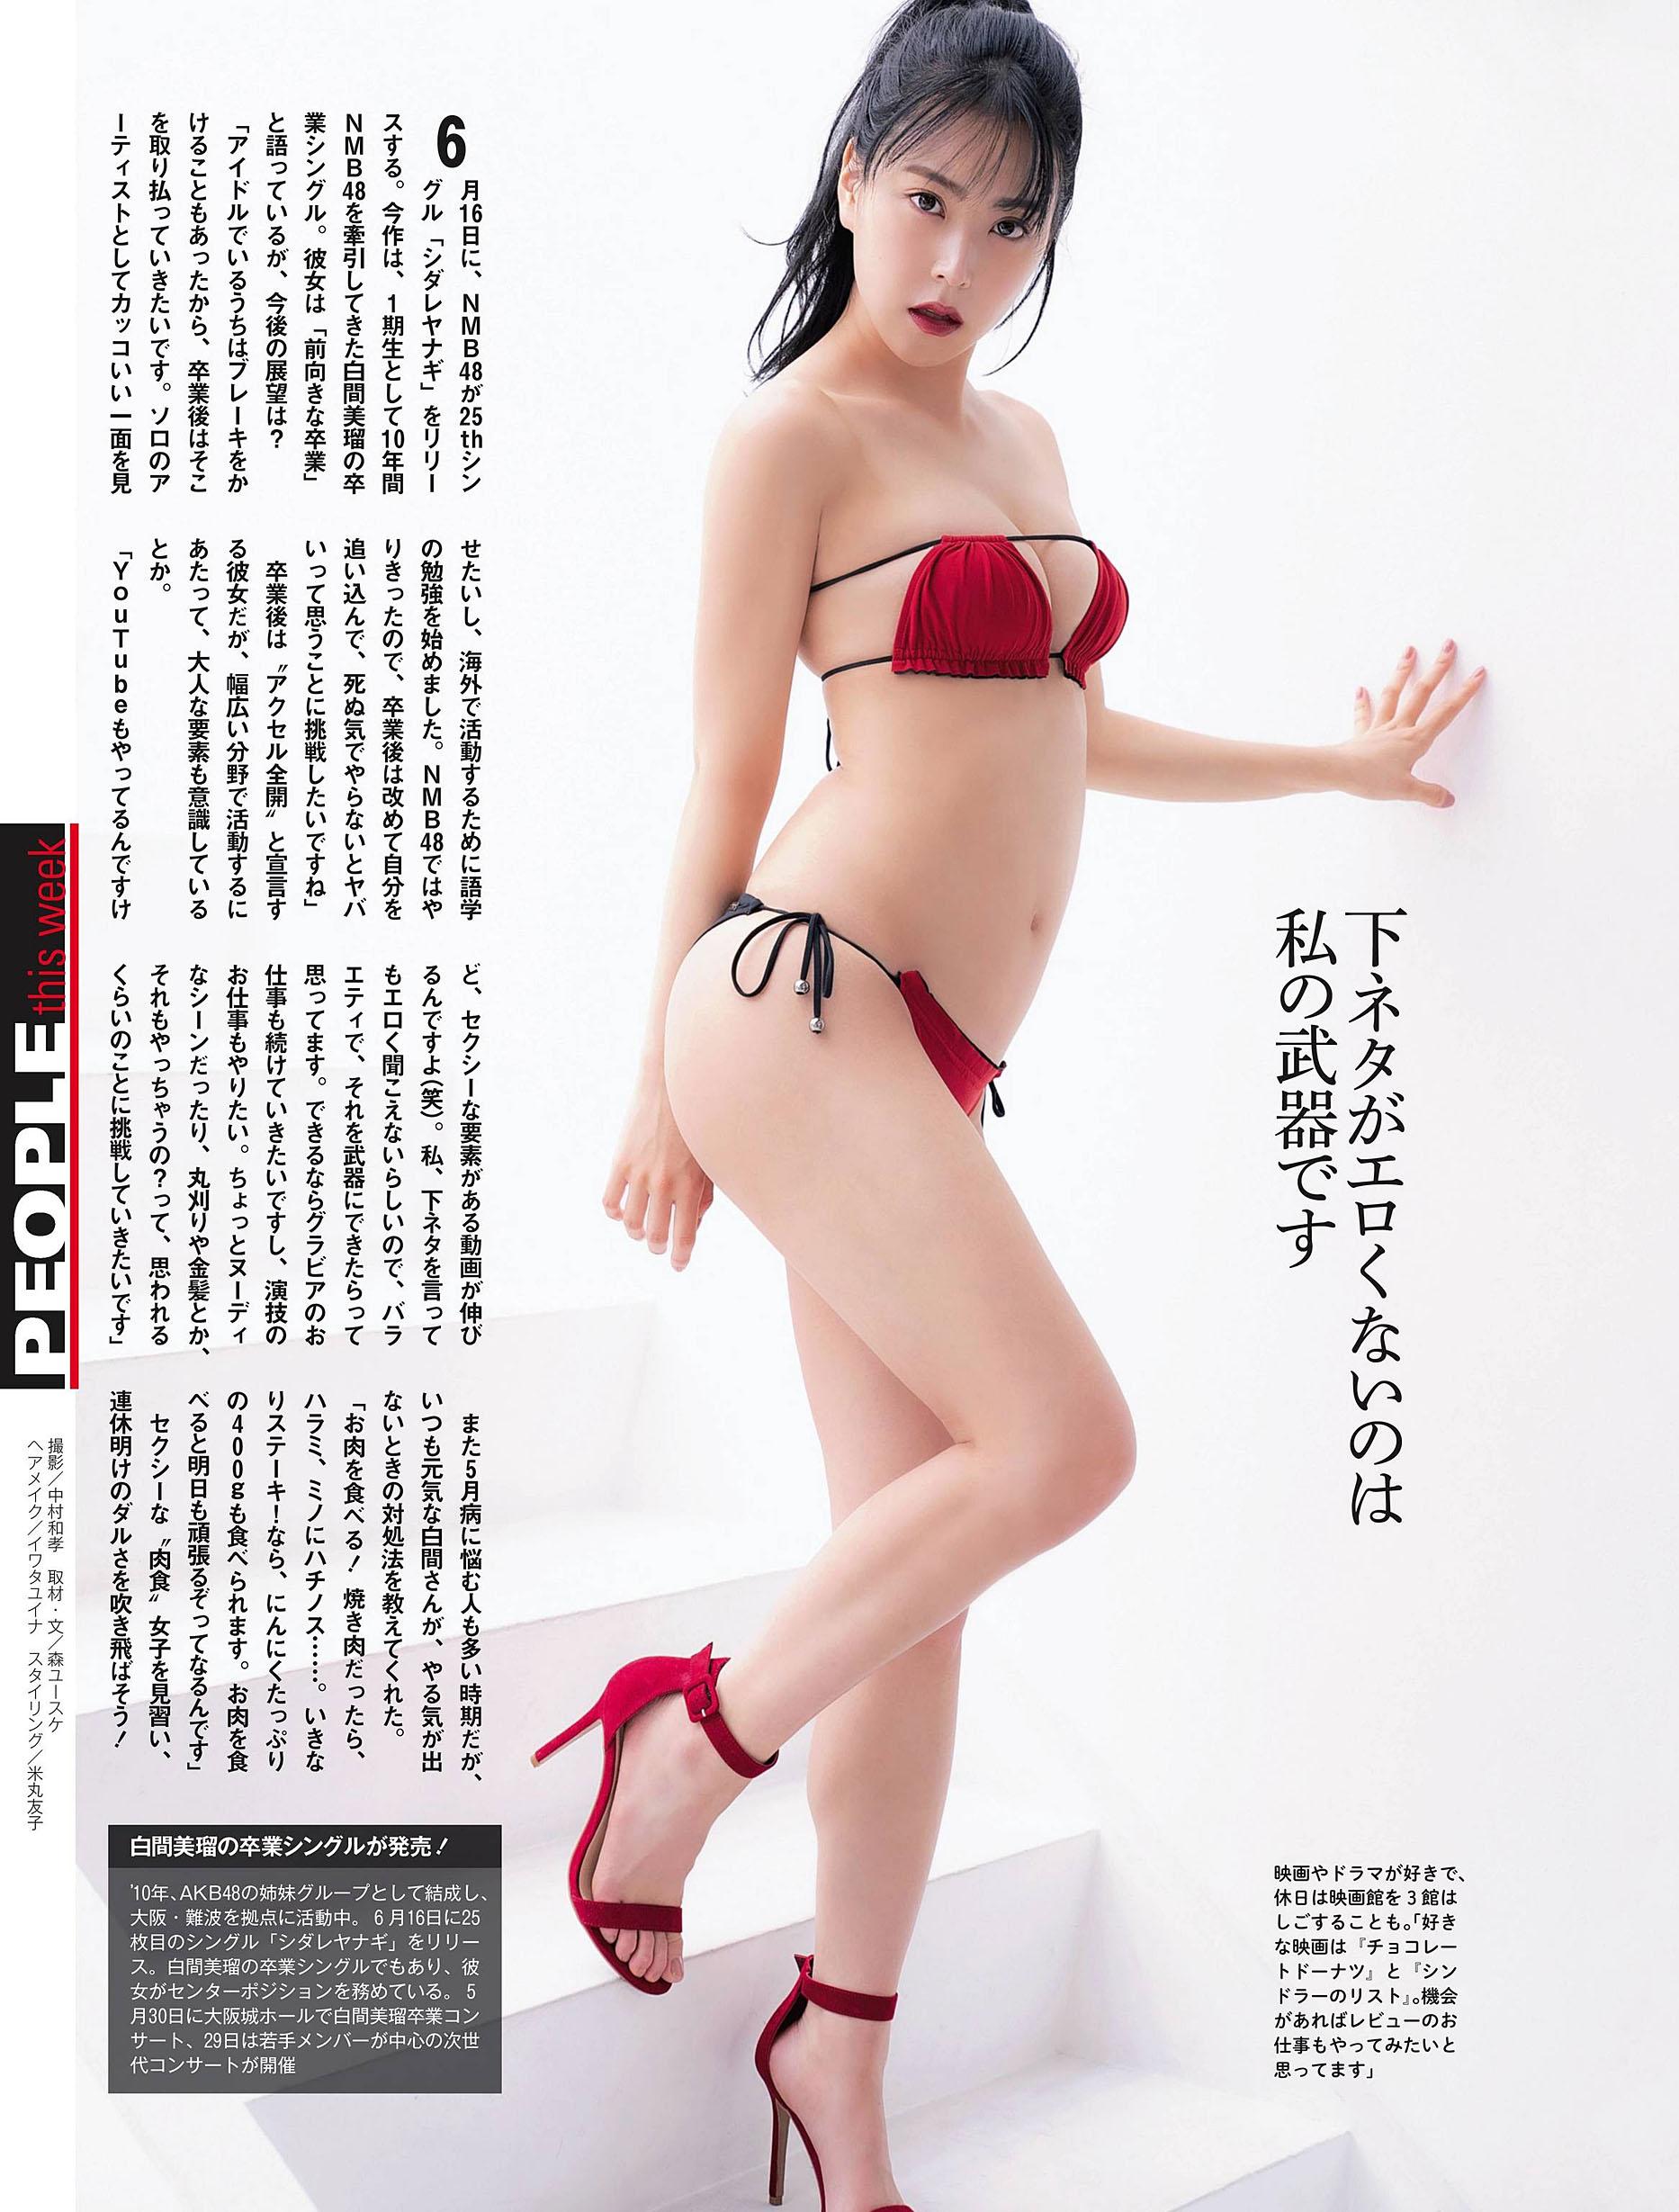 MShiroma Weekly SPA 210518 03.jpg